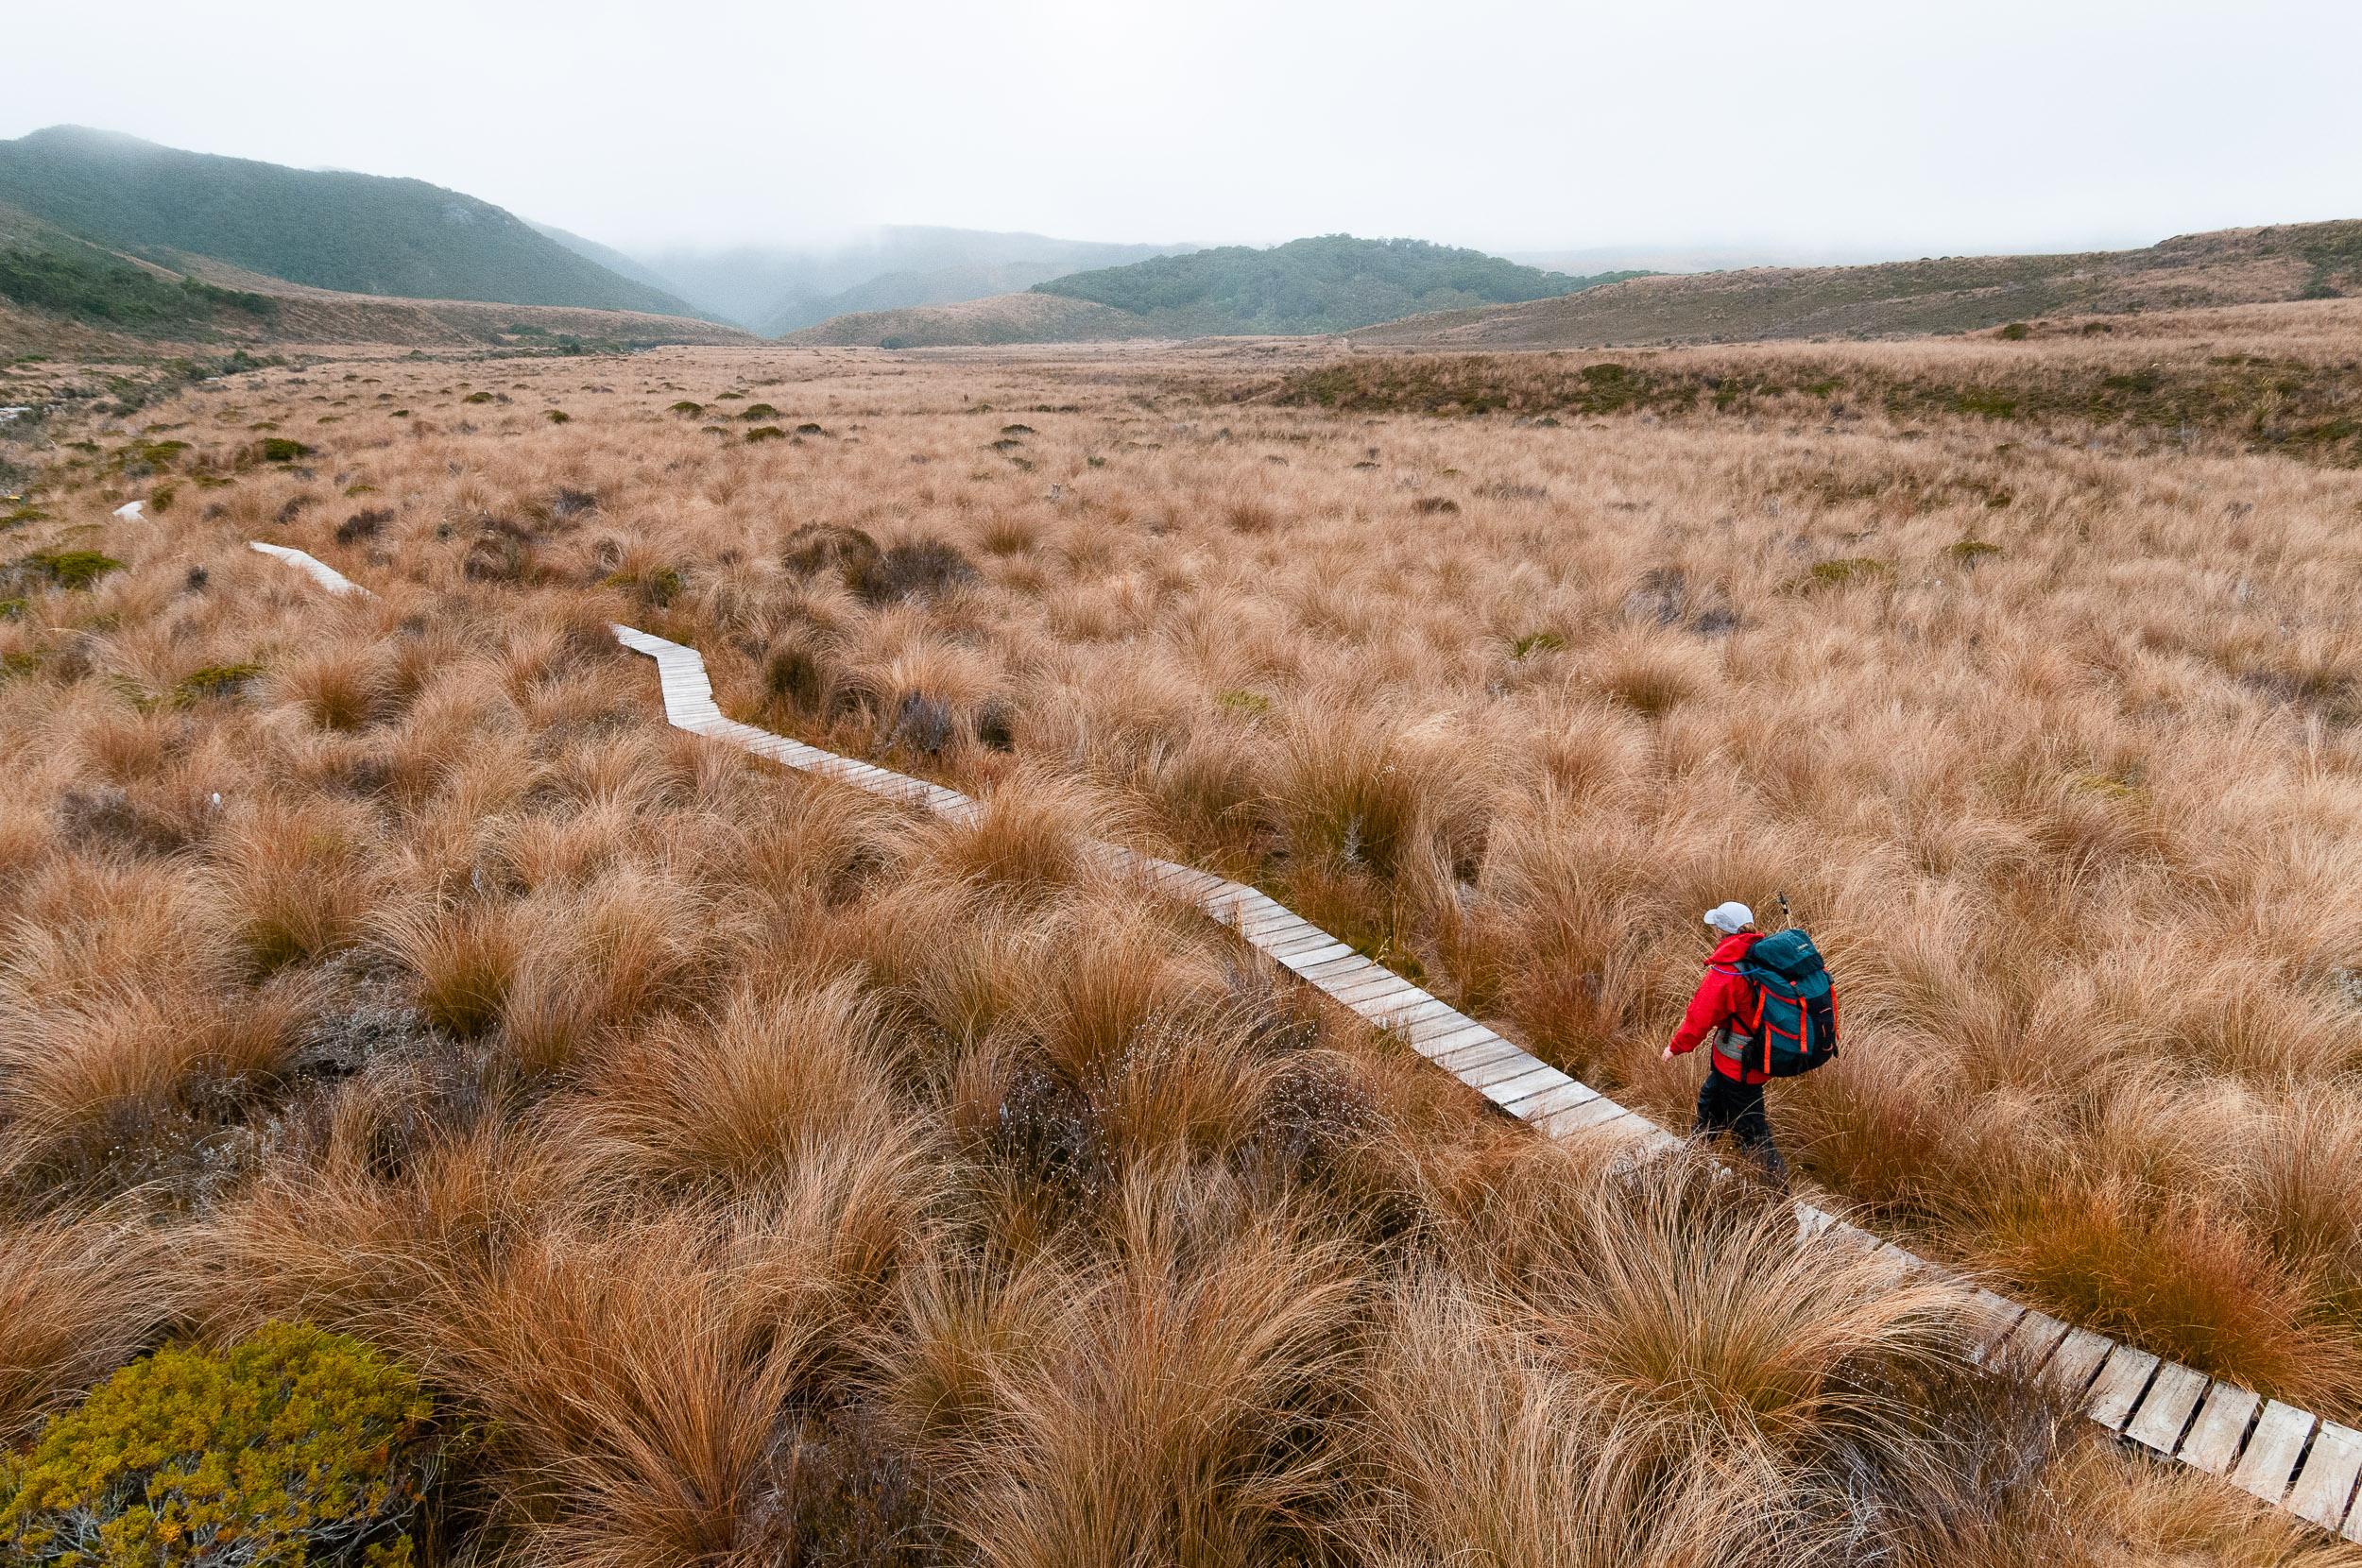 Crossing Gouland Downs, The Heaphy Track, New Zealand. © www.thomaspickard.com